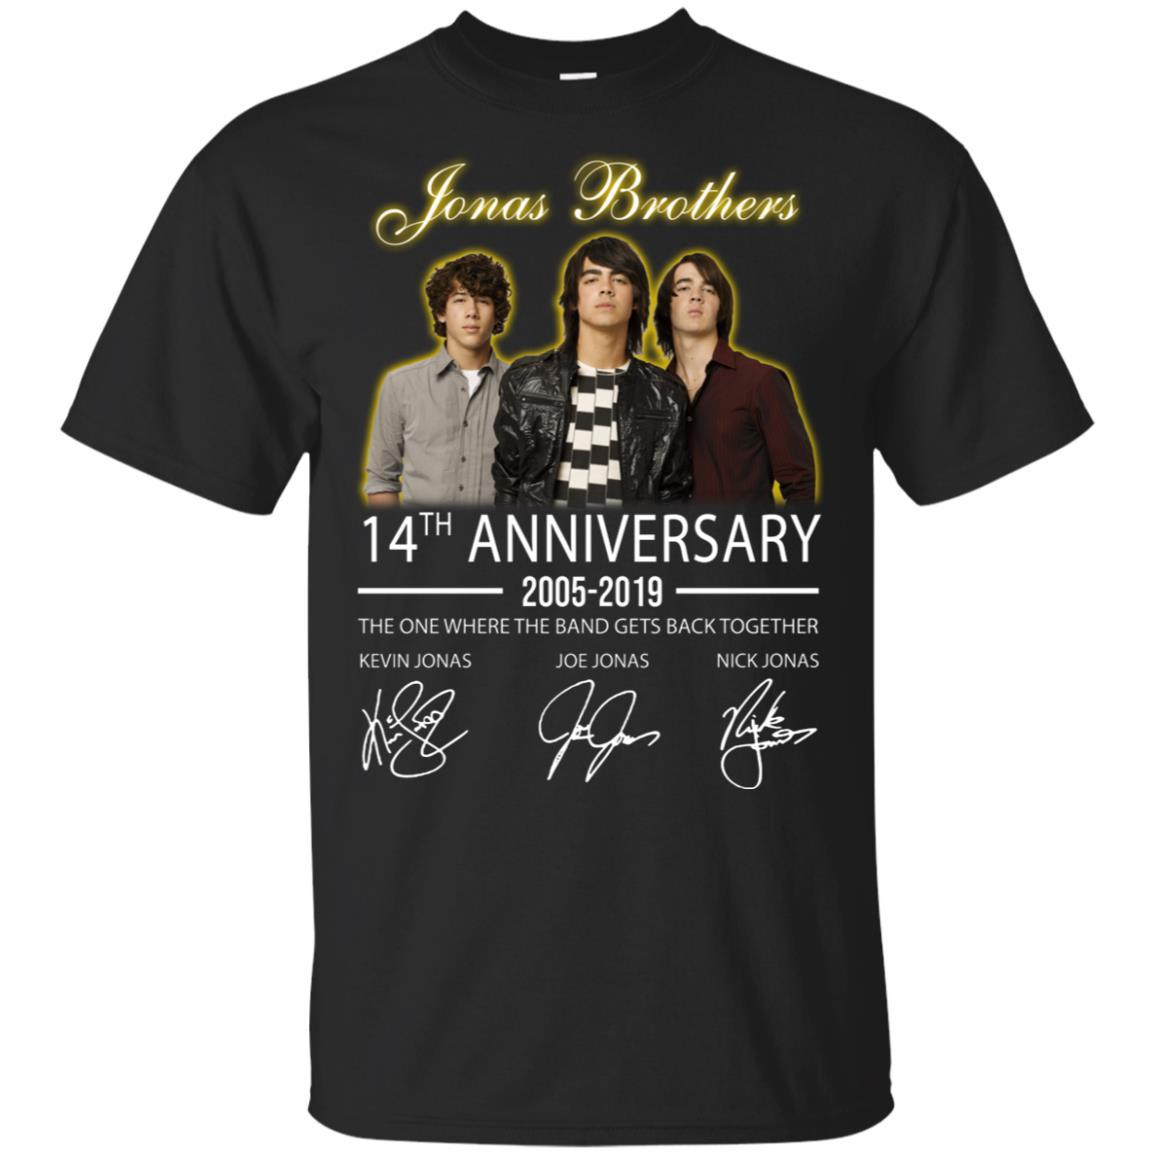 42919a4b5 Jonas Brothers 14th anniversary 2005-2019 hoodie, t shirt -  RobinPlaceFabrics